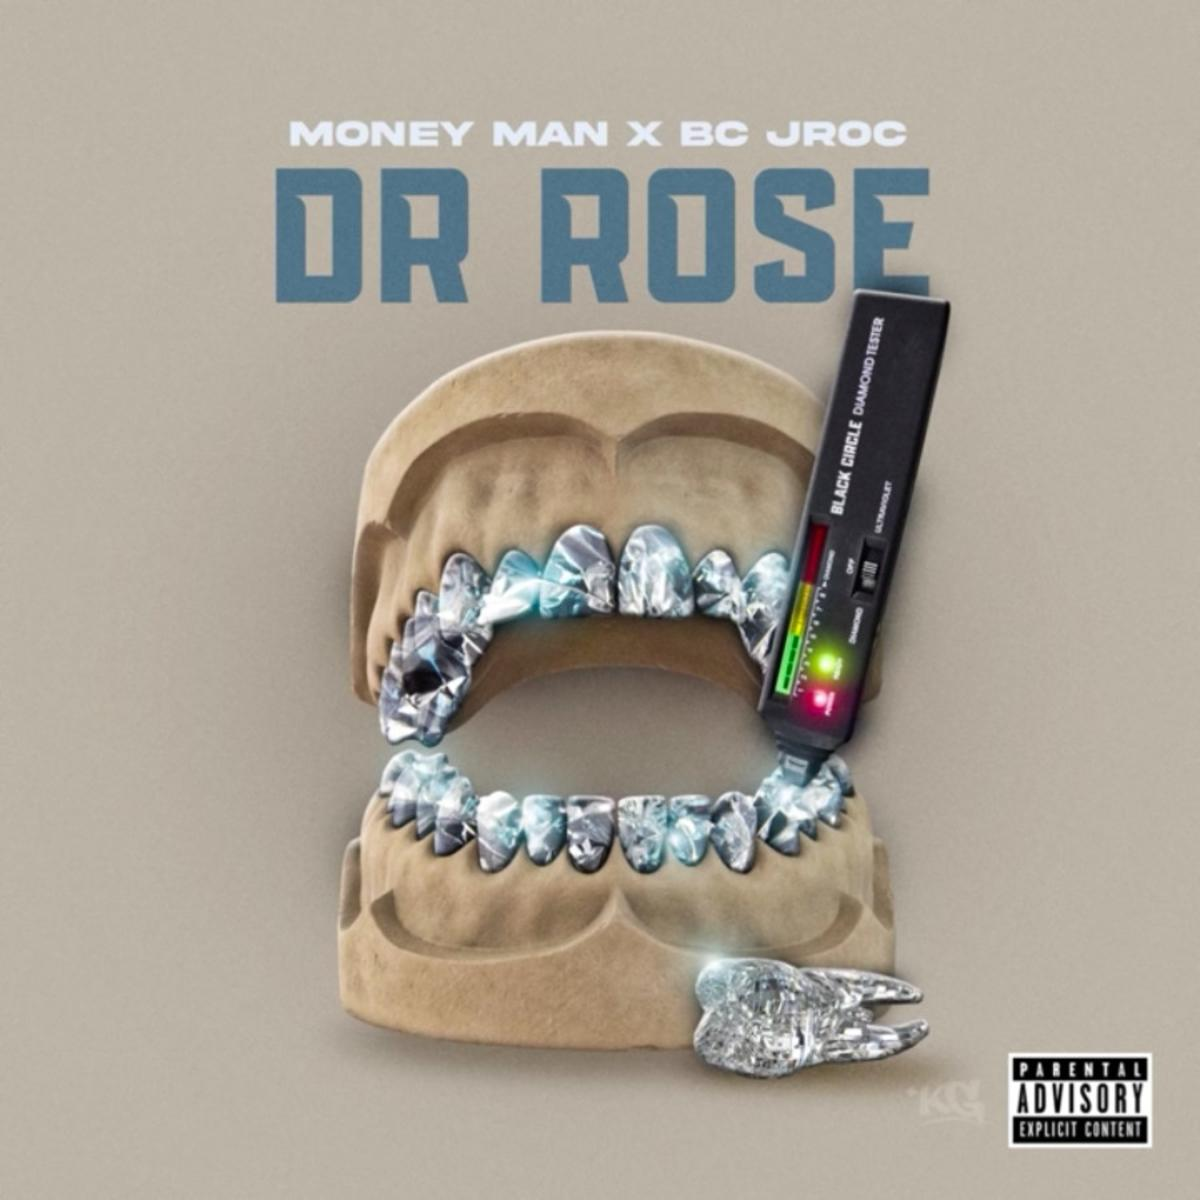 MP3: Money Man - Dr. Rose Ft. BC Jroc